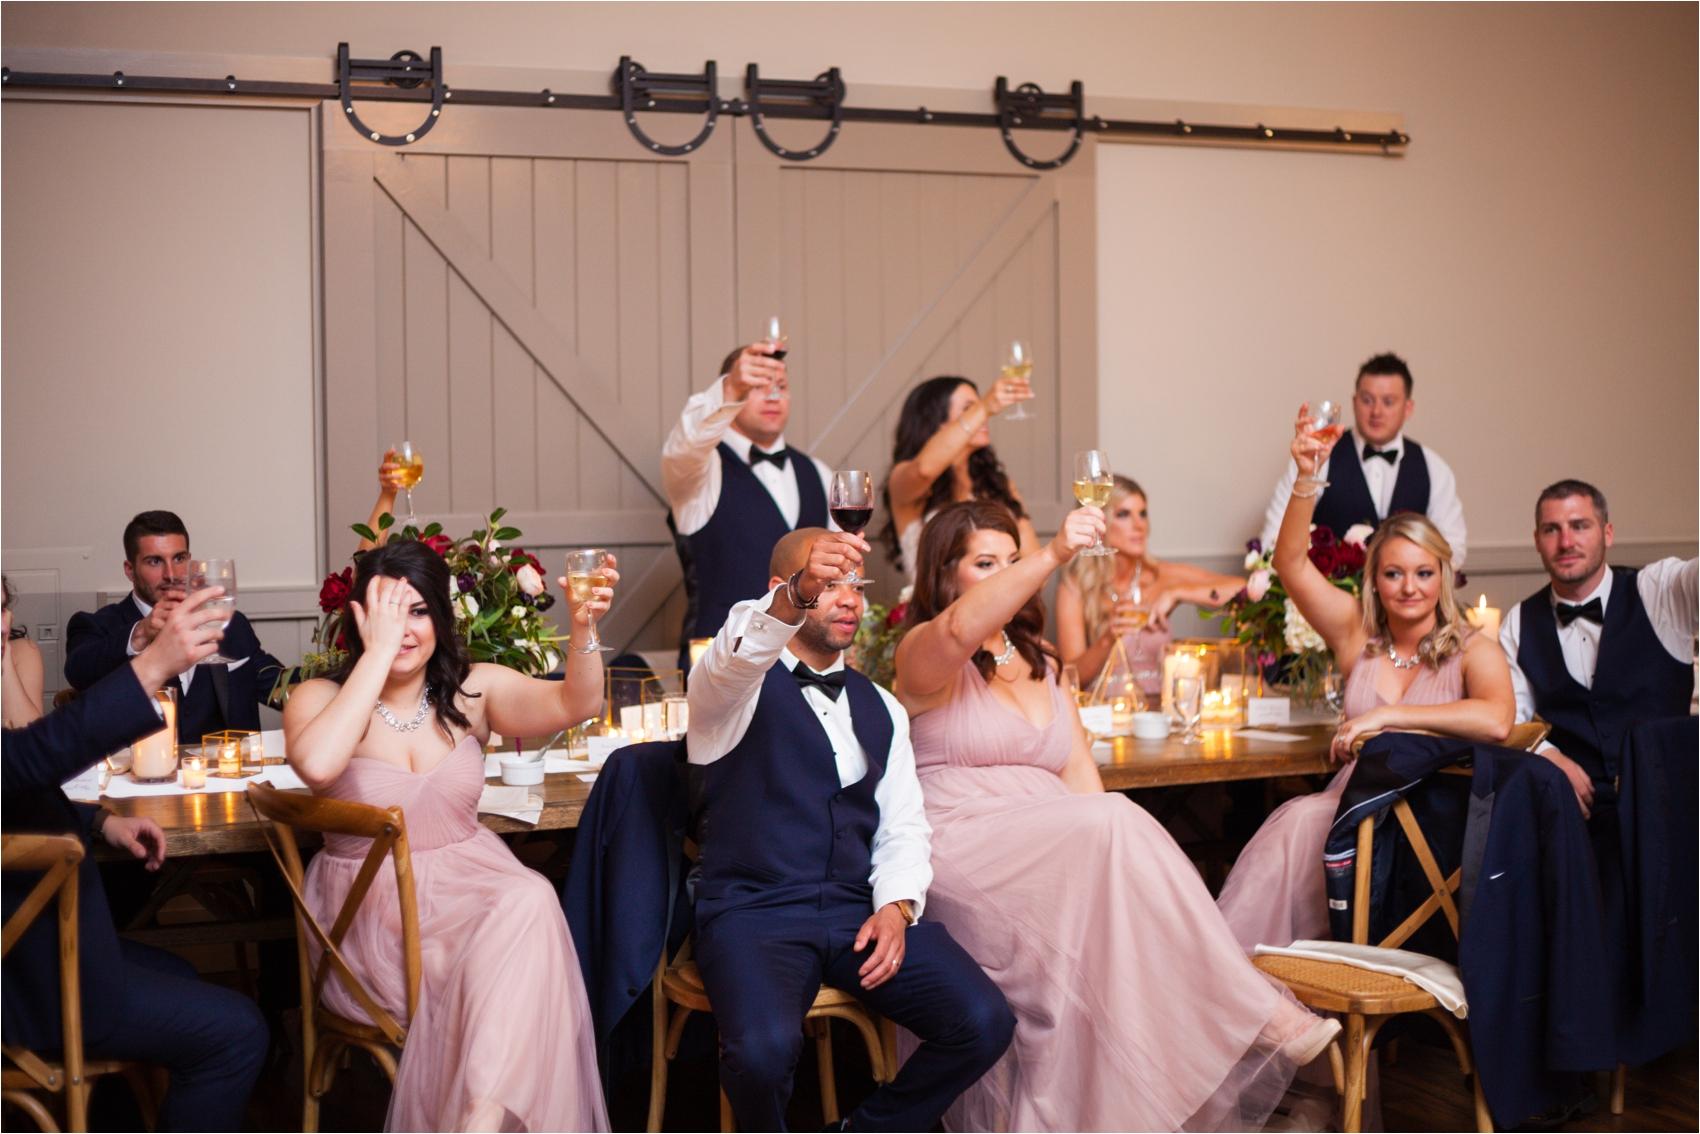 King-Family-Vineyard-Spring-Virginia-Wedding-2089.jpg